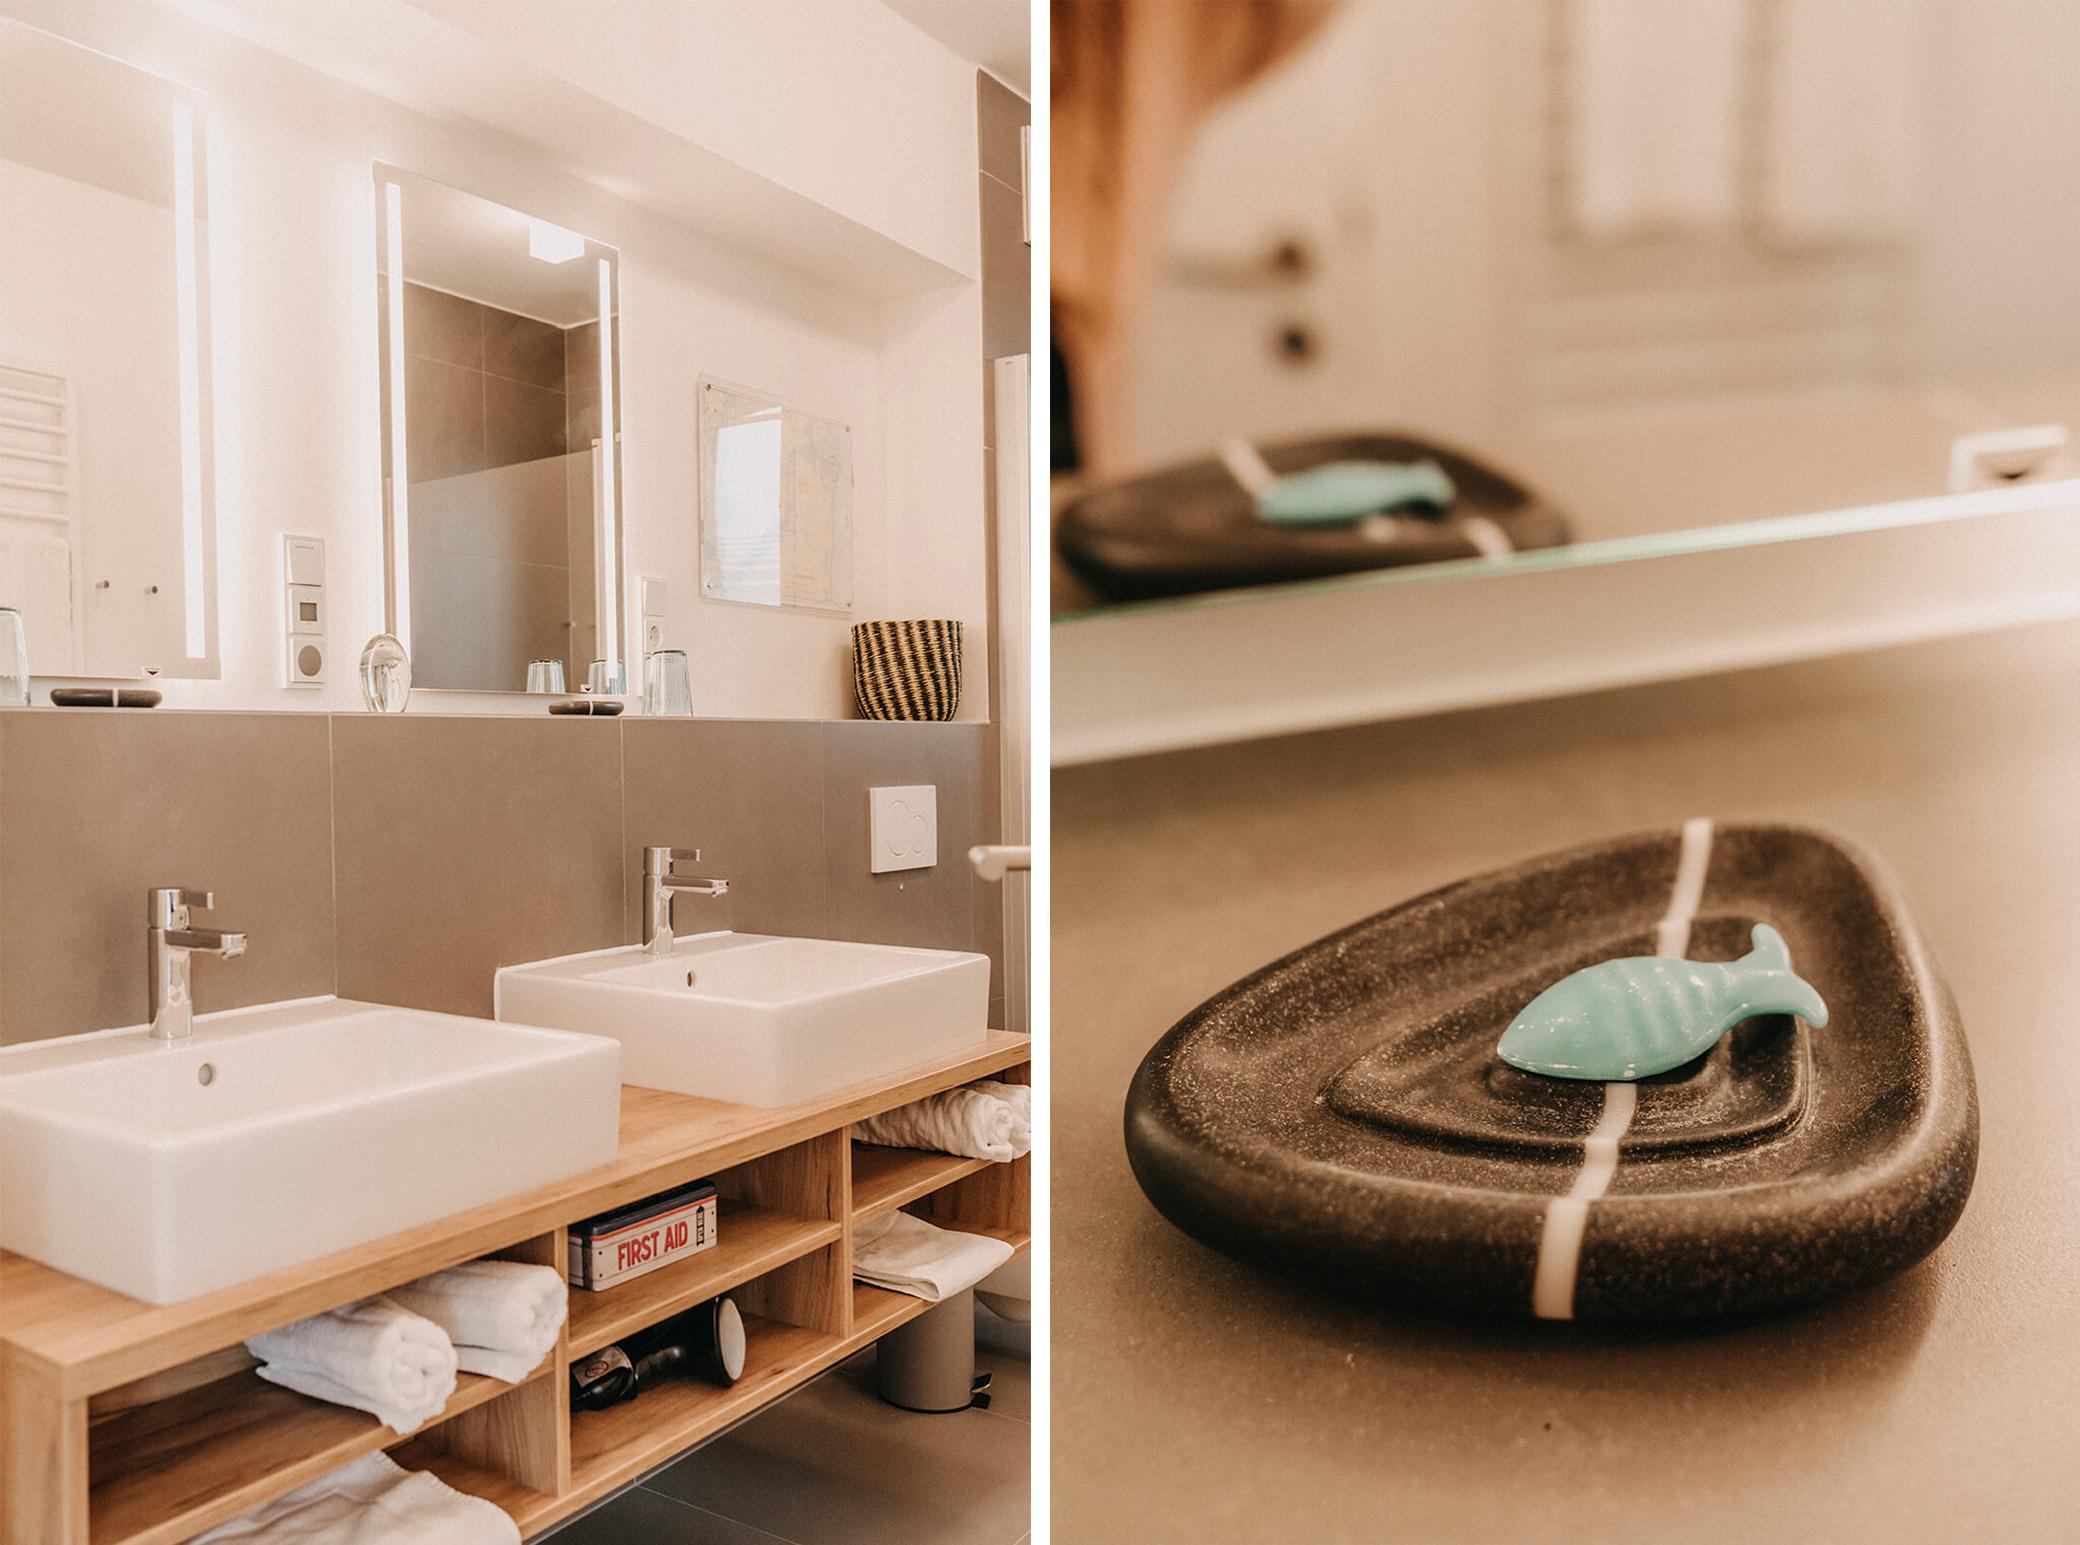 Badezimmerdetails Speicherquartier Kappeln